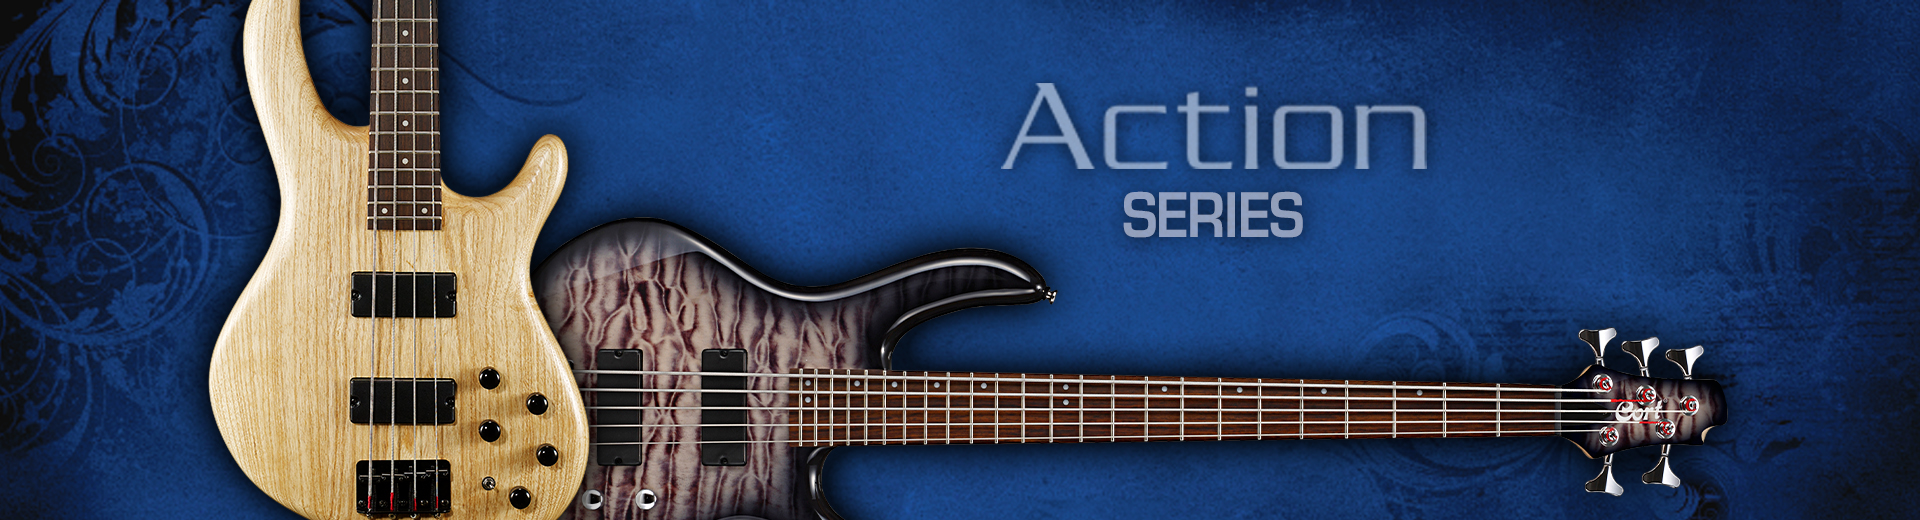 action-series-banner.jpg